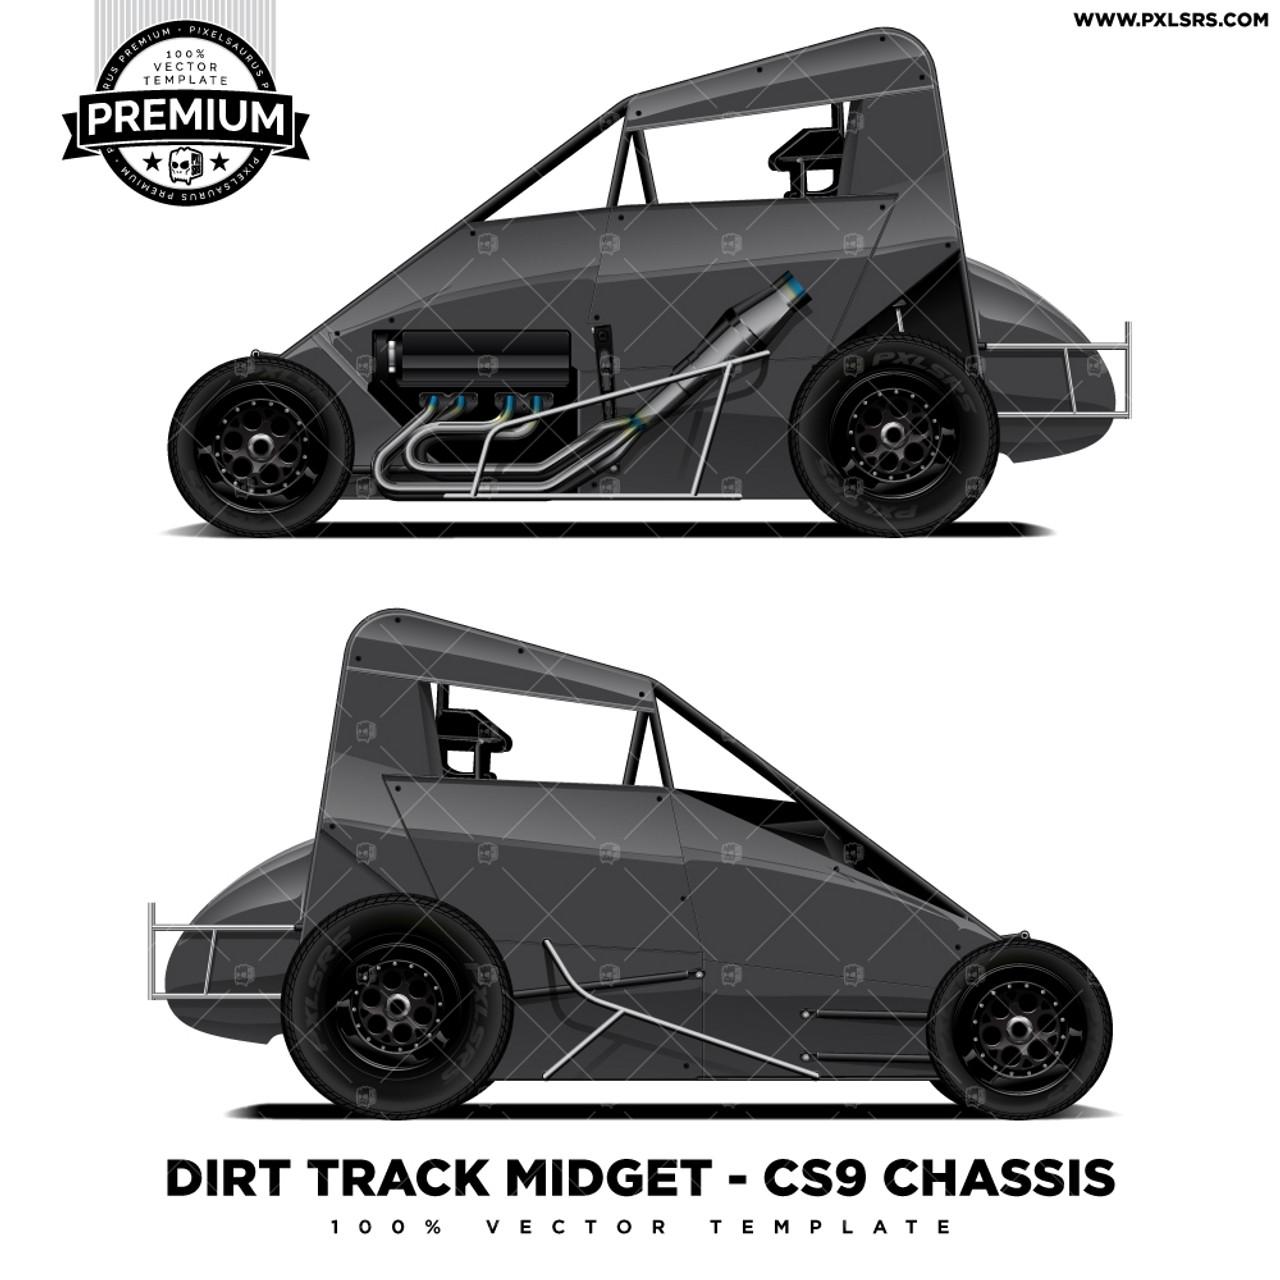 Dirt Track Midget CS9 Chassis 'Premium' Vector Template